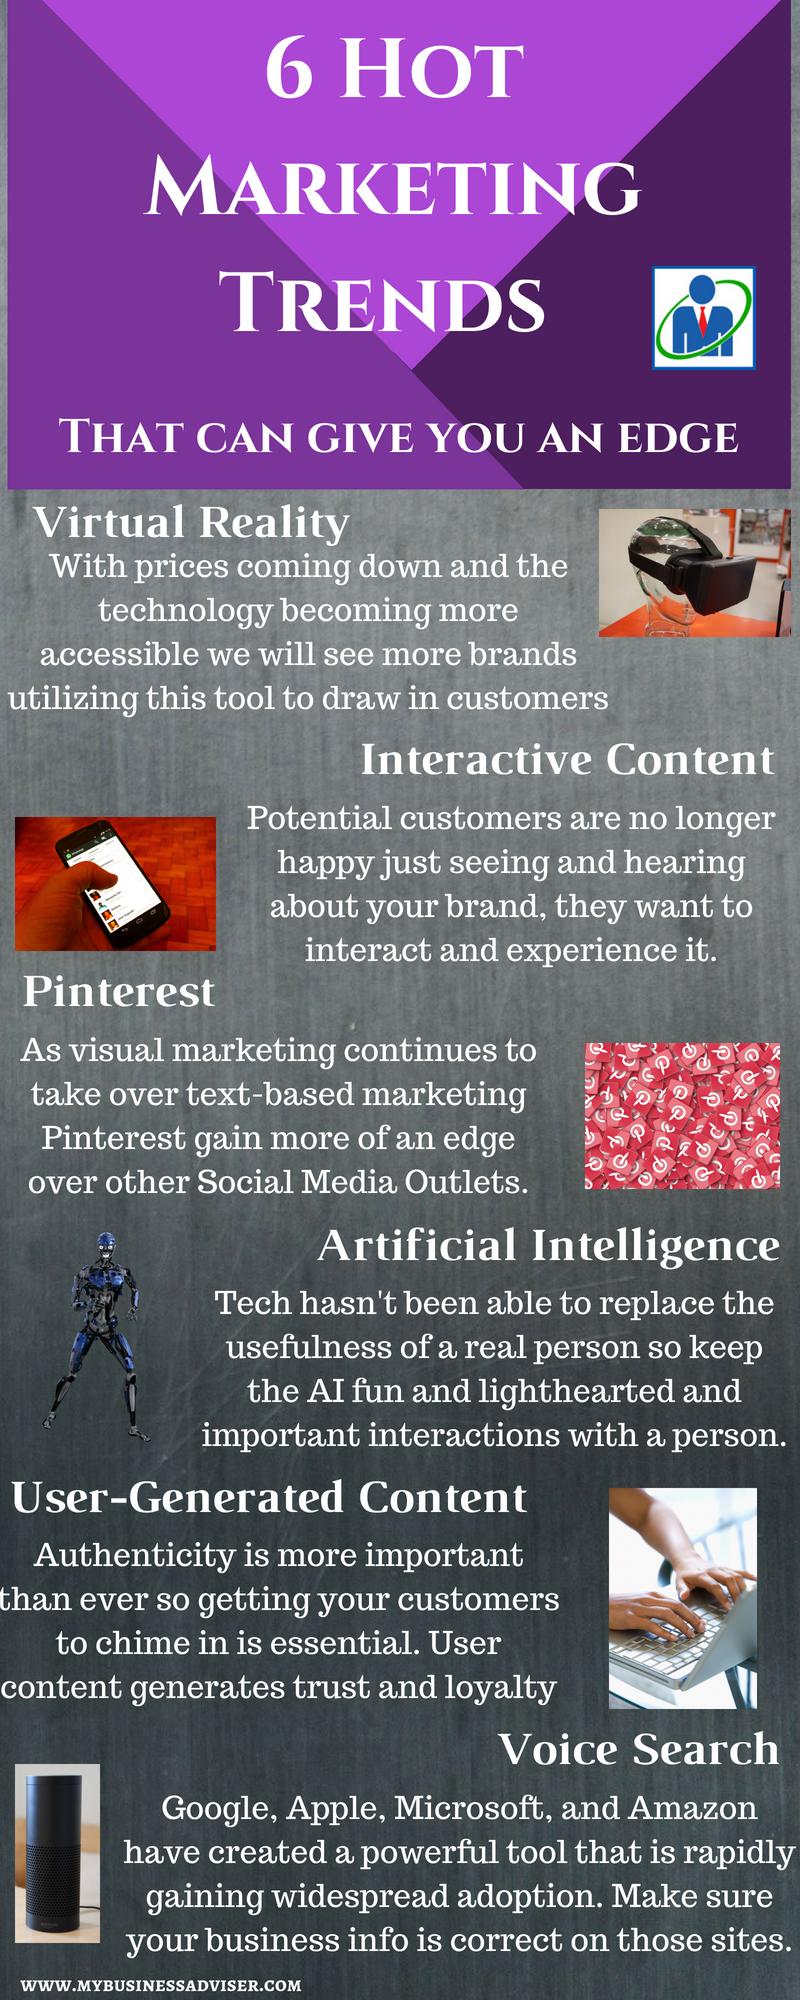 6 Hot Marketing Trends (1)